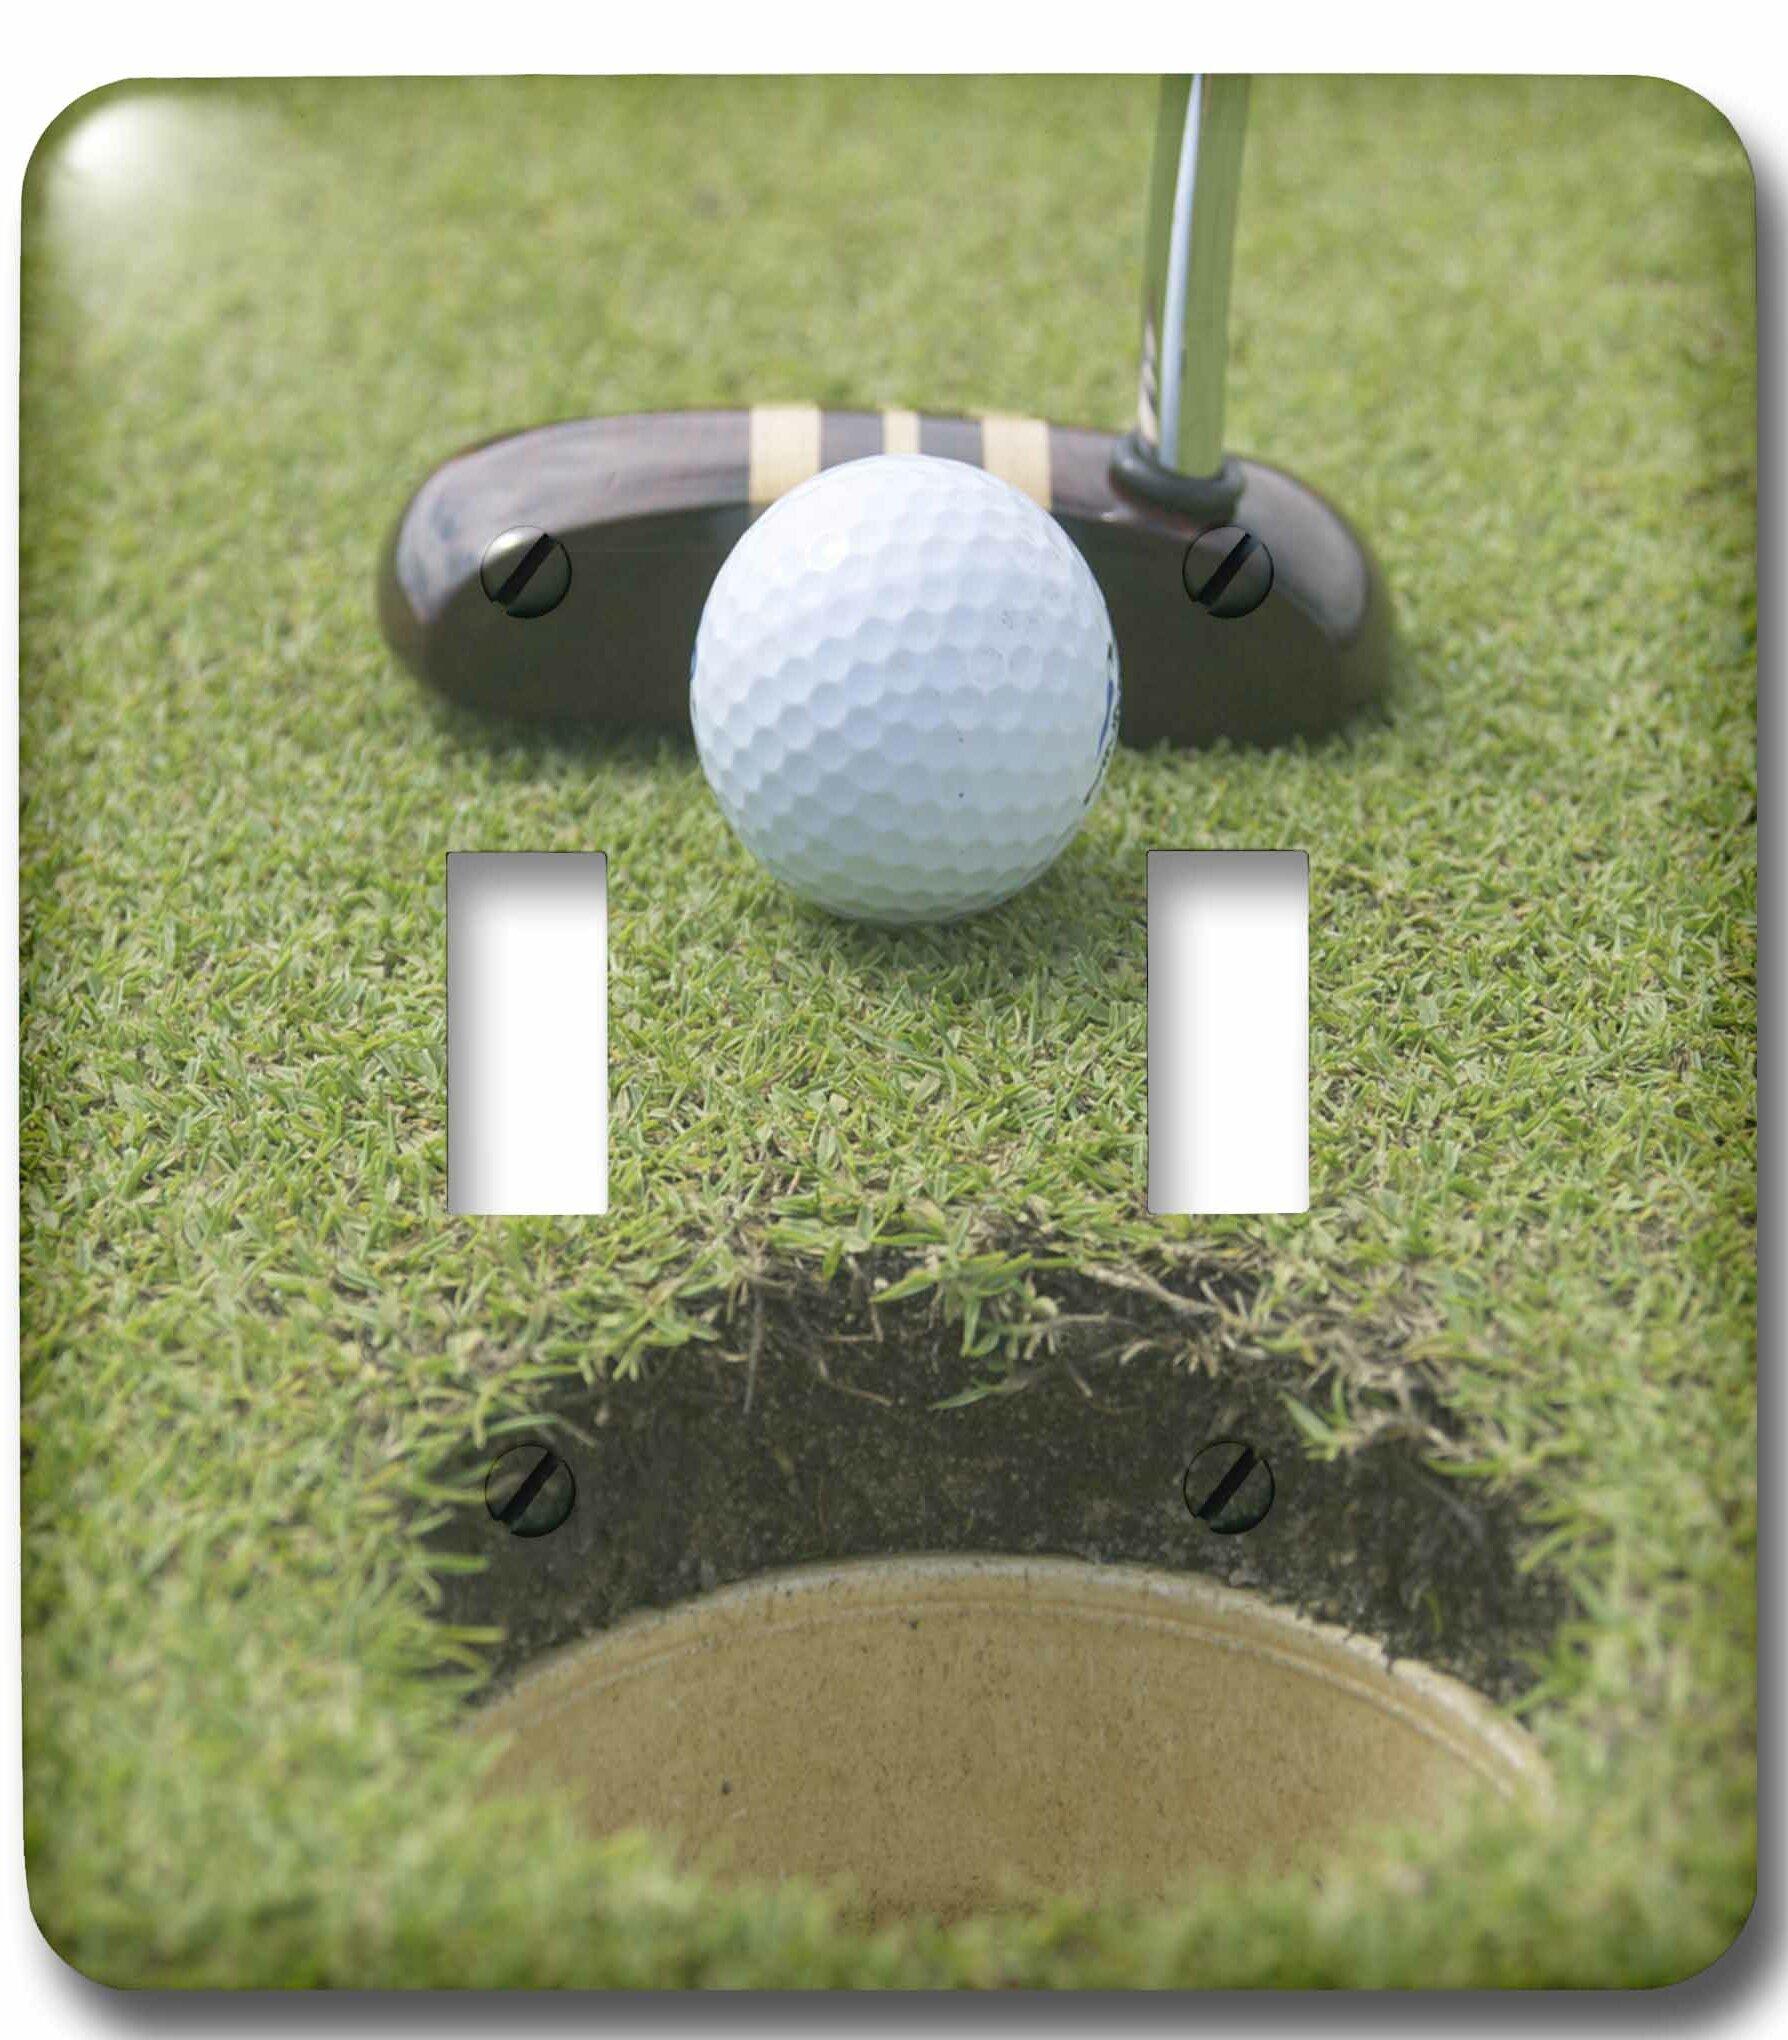 3drose Punta Blanca Golf Club 2 Gang Toggle Light Switch Wall Plate Wayfair